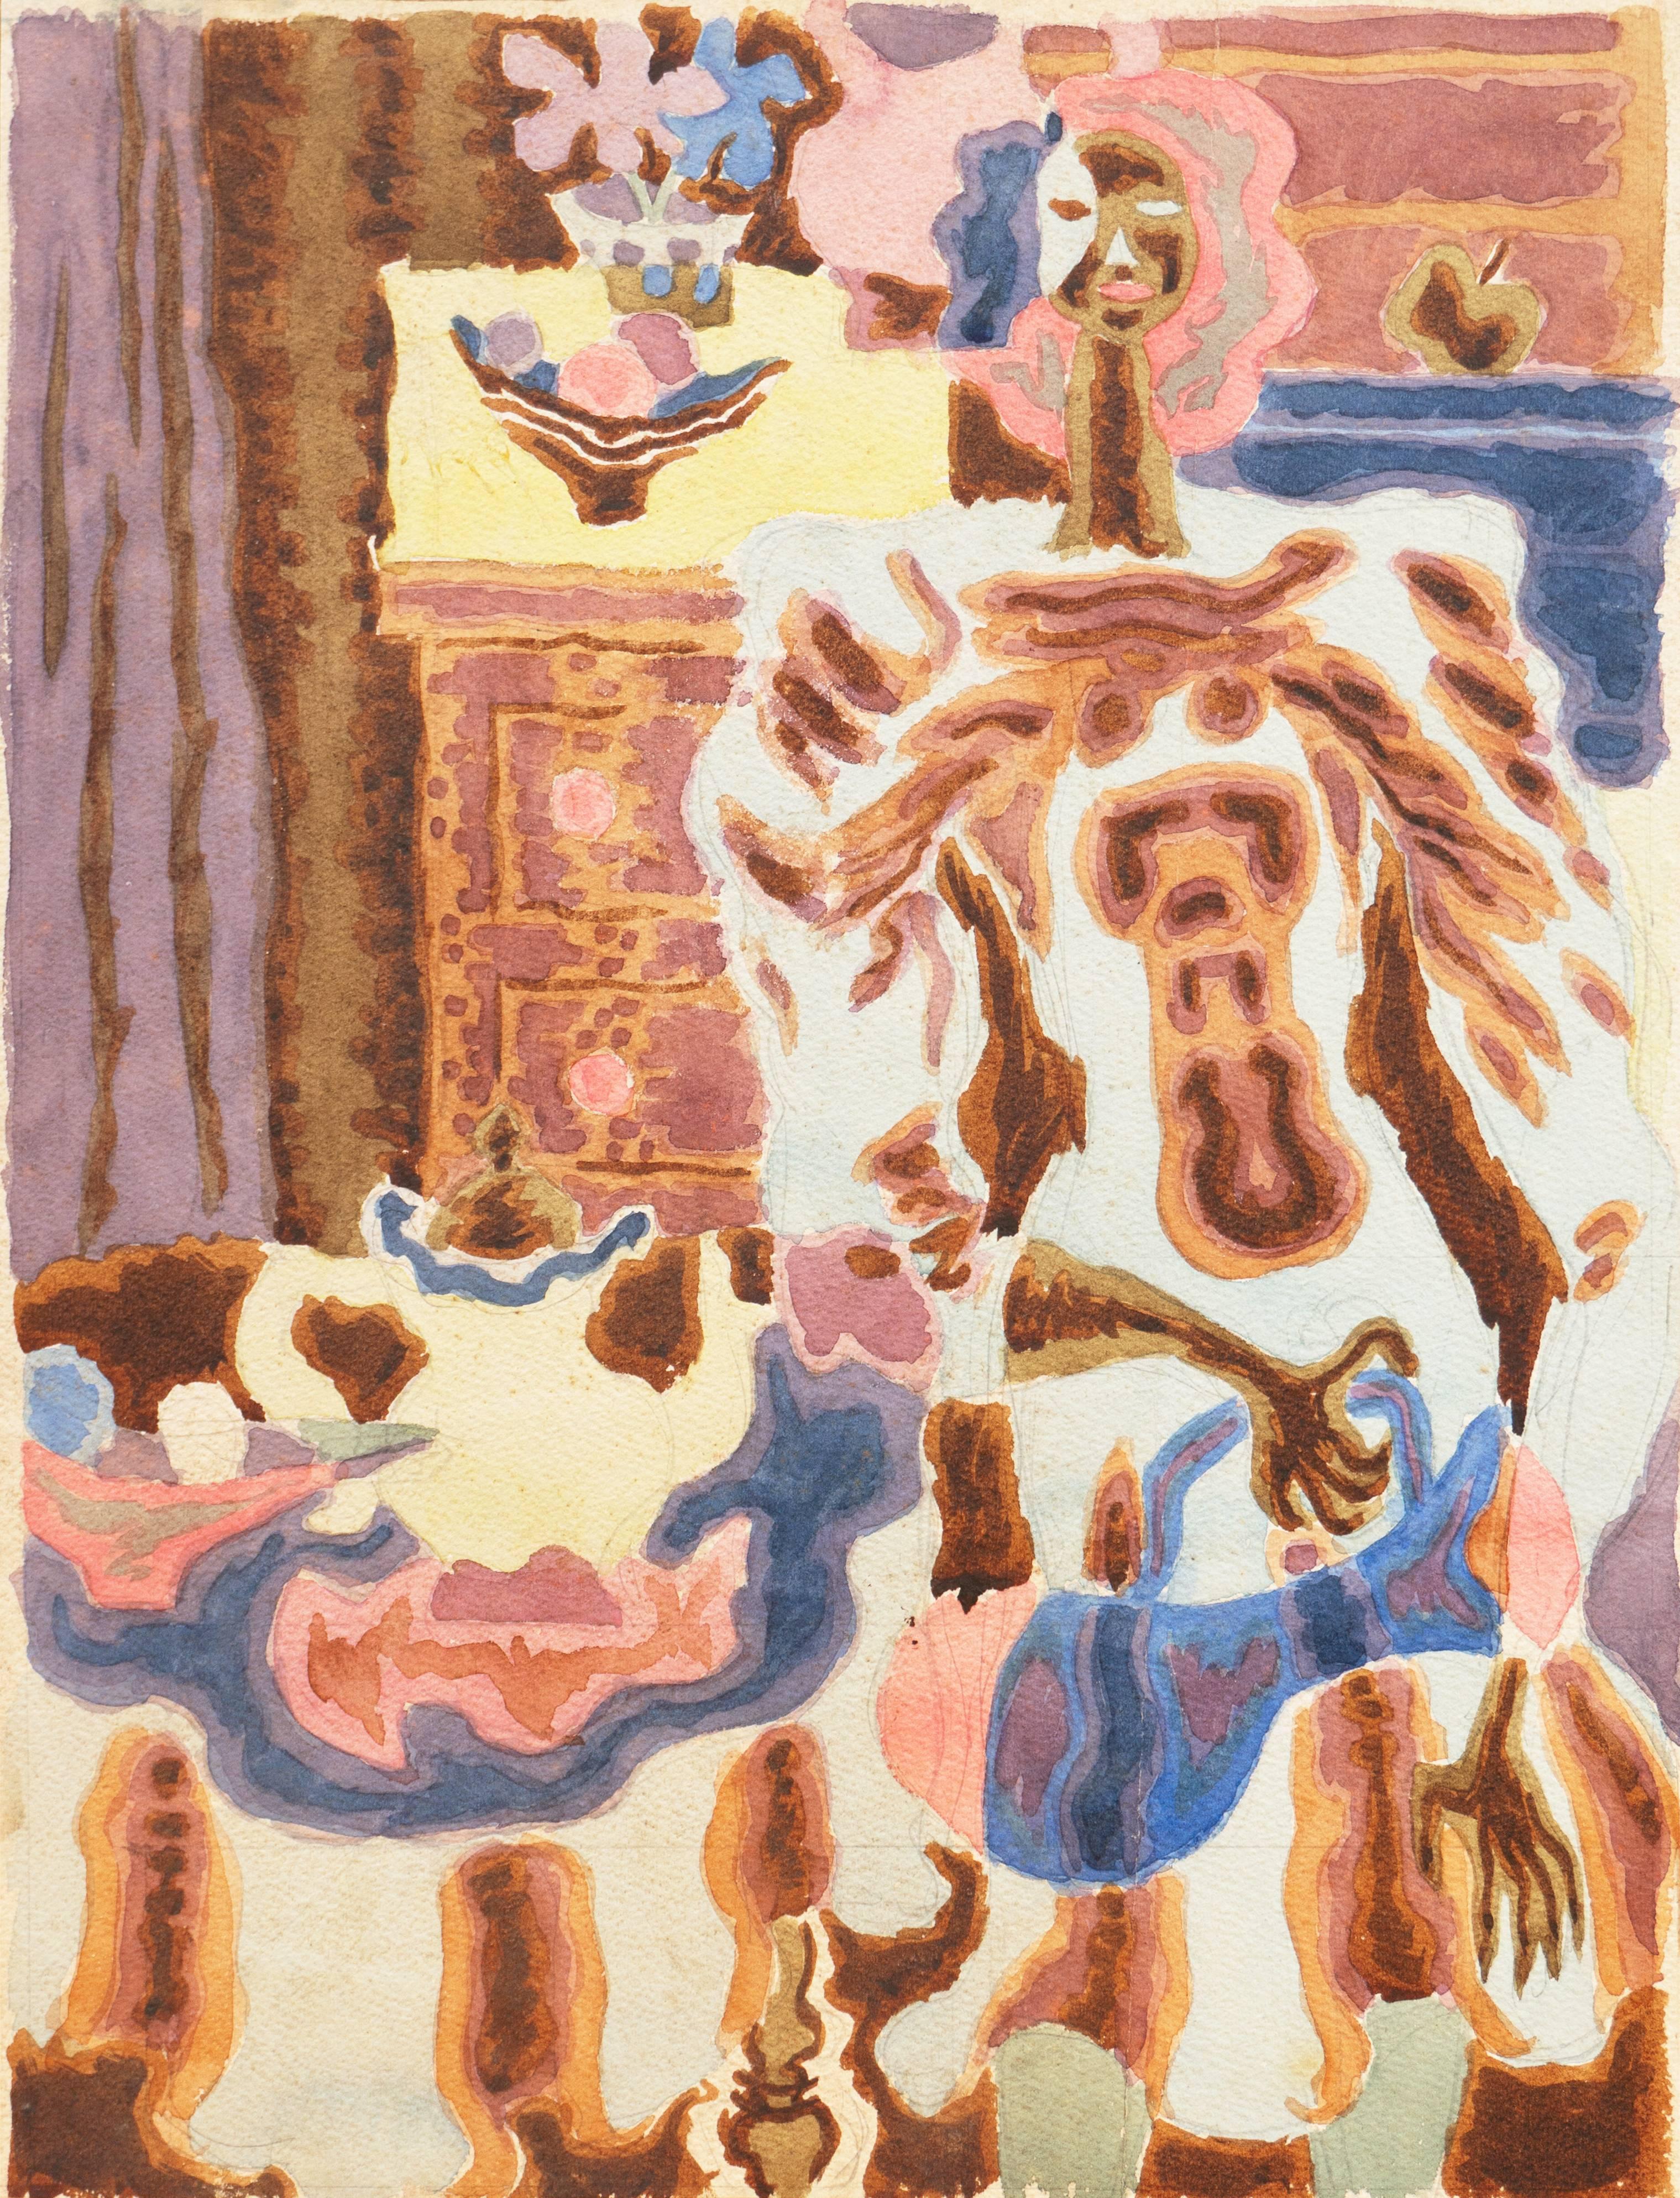 California Post-Impressionist 'Woman Seated', Louvre, Académie Chaumière, LACMA